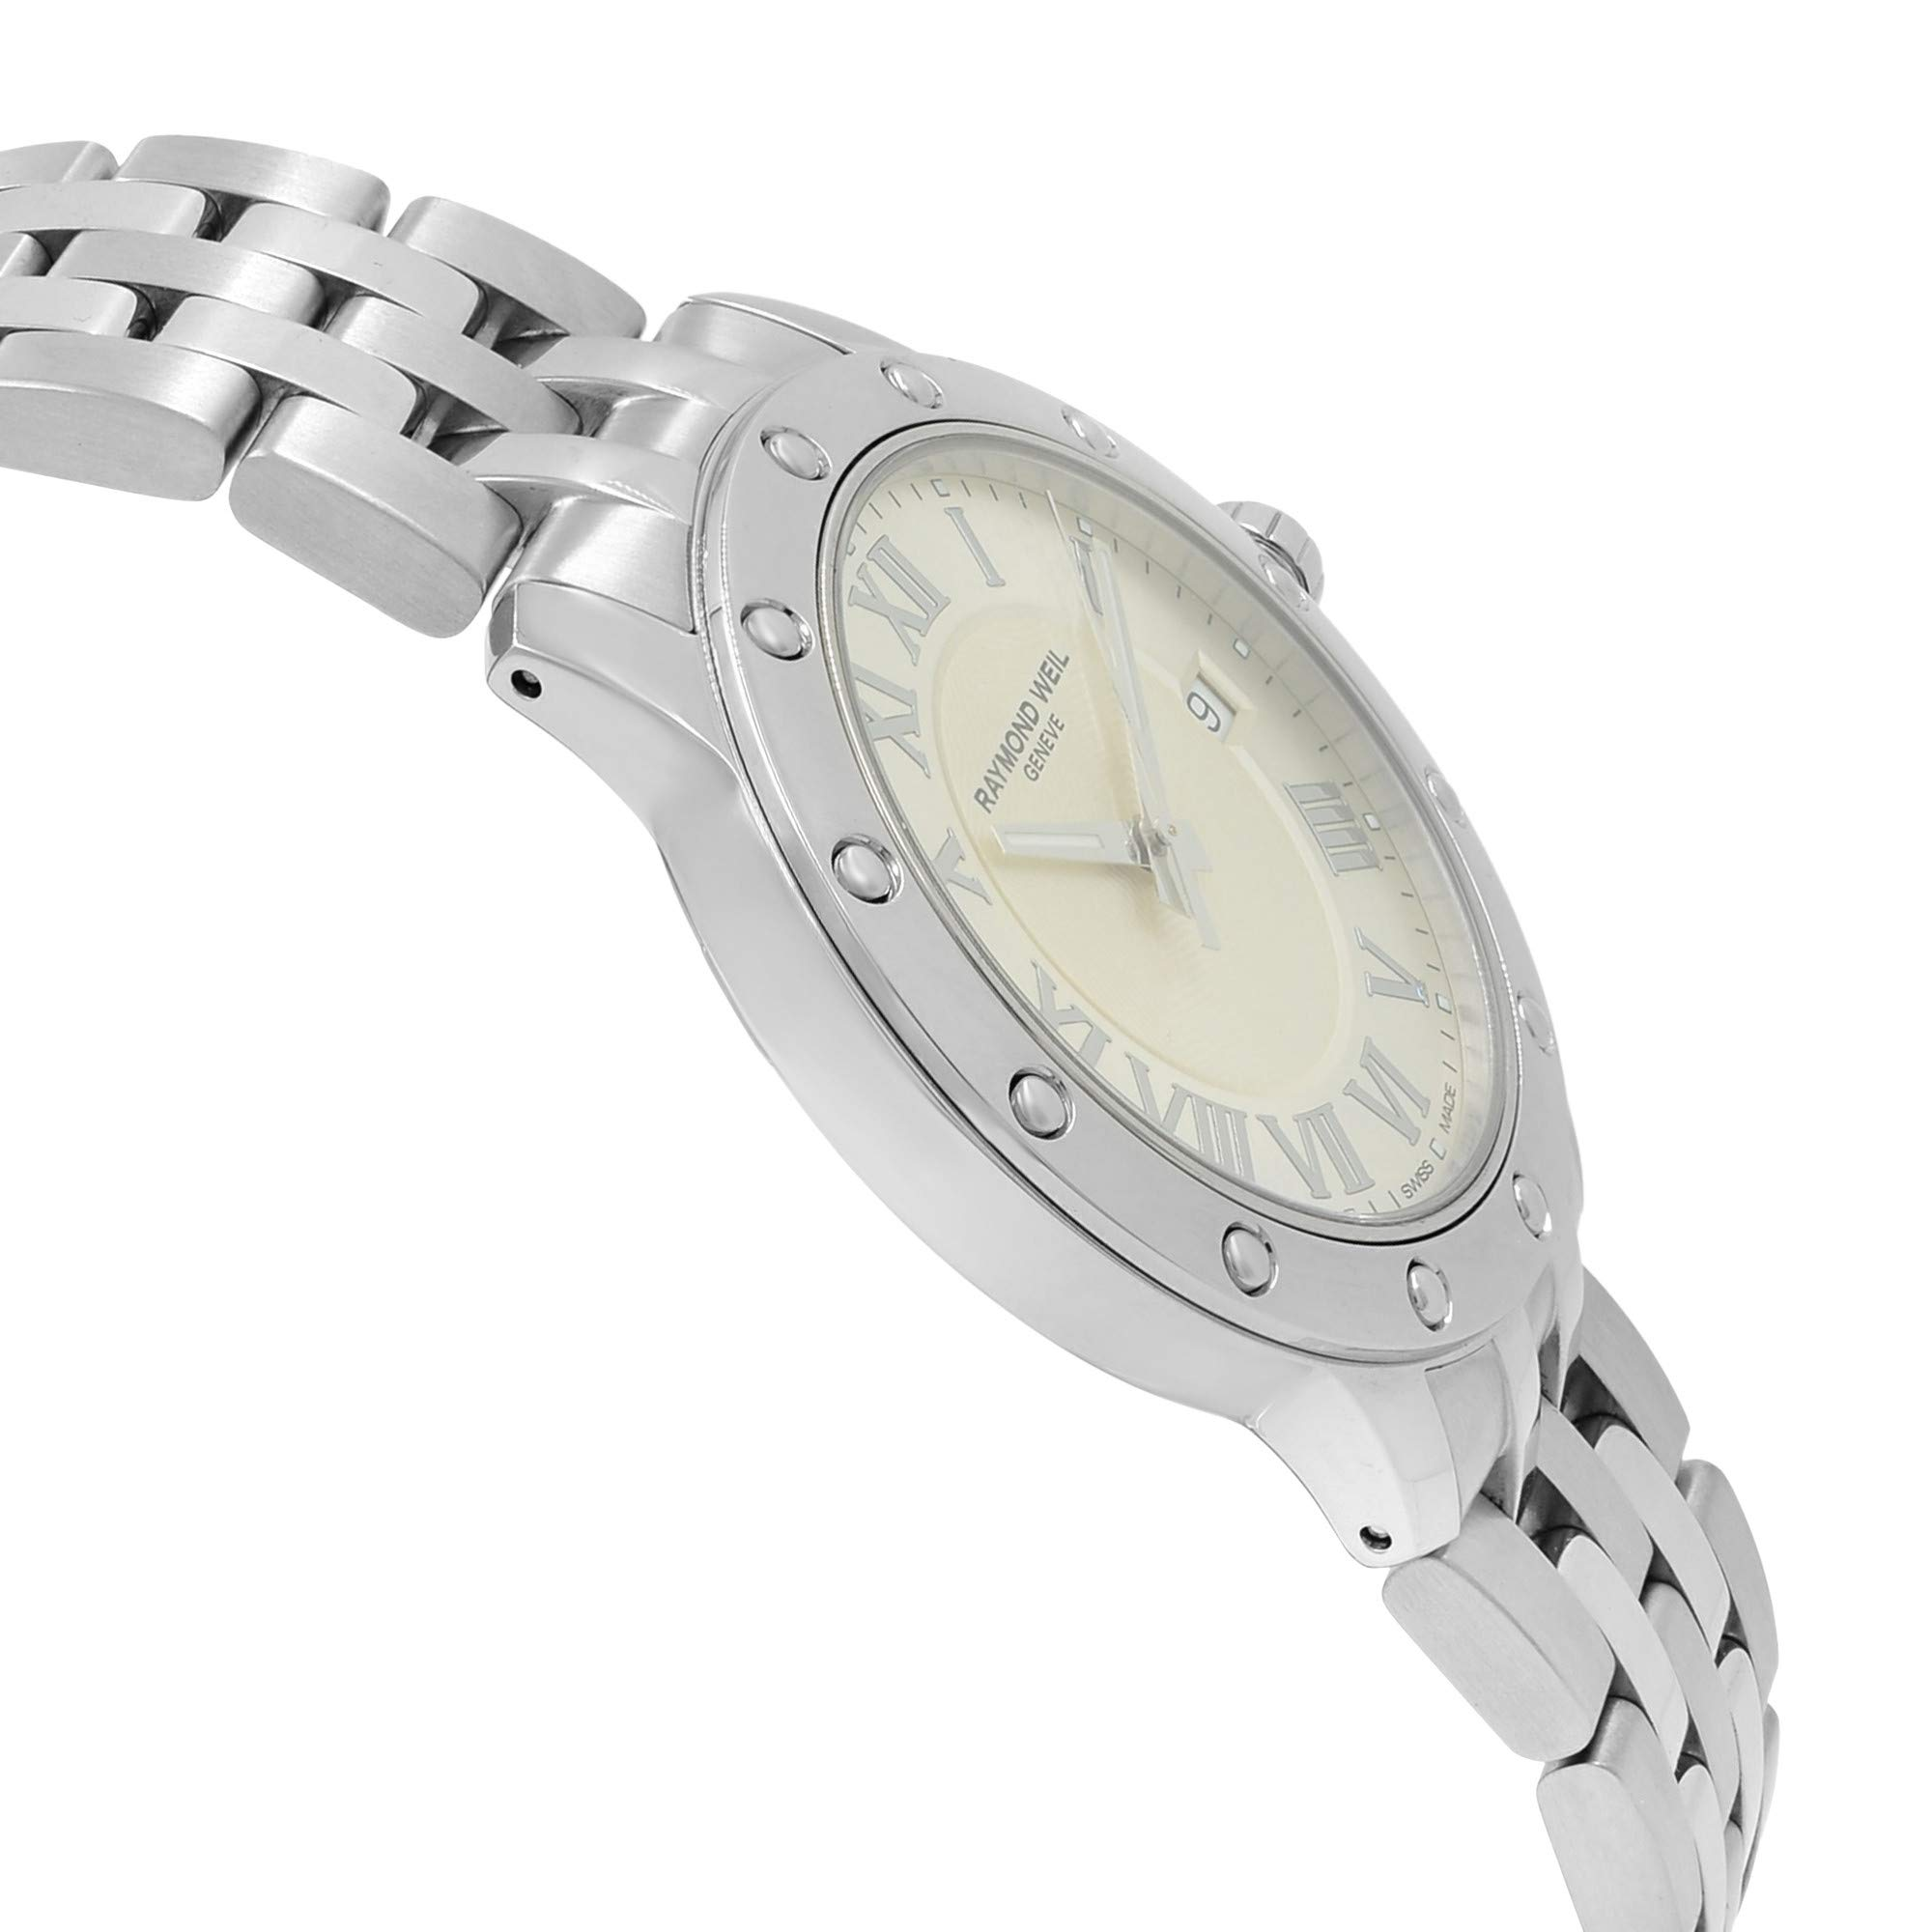 Raymond Weil Tango Quartz Male Watch 5599-ST-00658 (Certified Pre-Owned) by RAYMOND WEIL (Image #4)